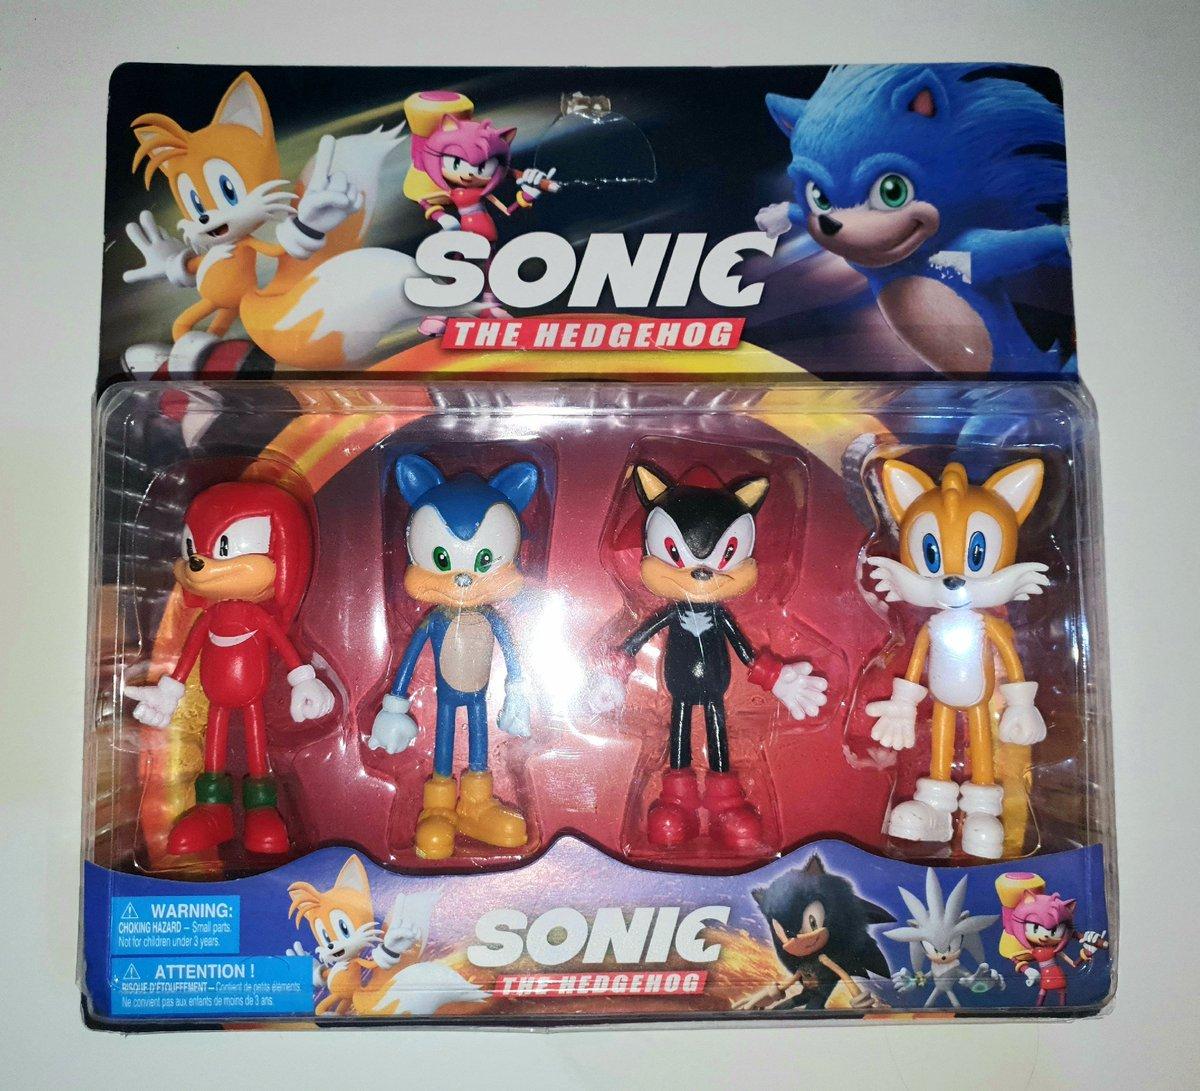 Supersoniccon On Twitter We Finally Found Some Sonicmovie